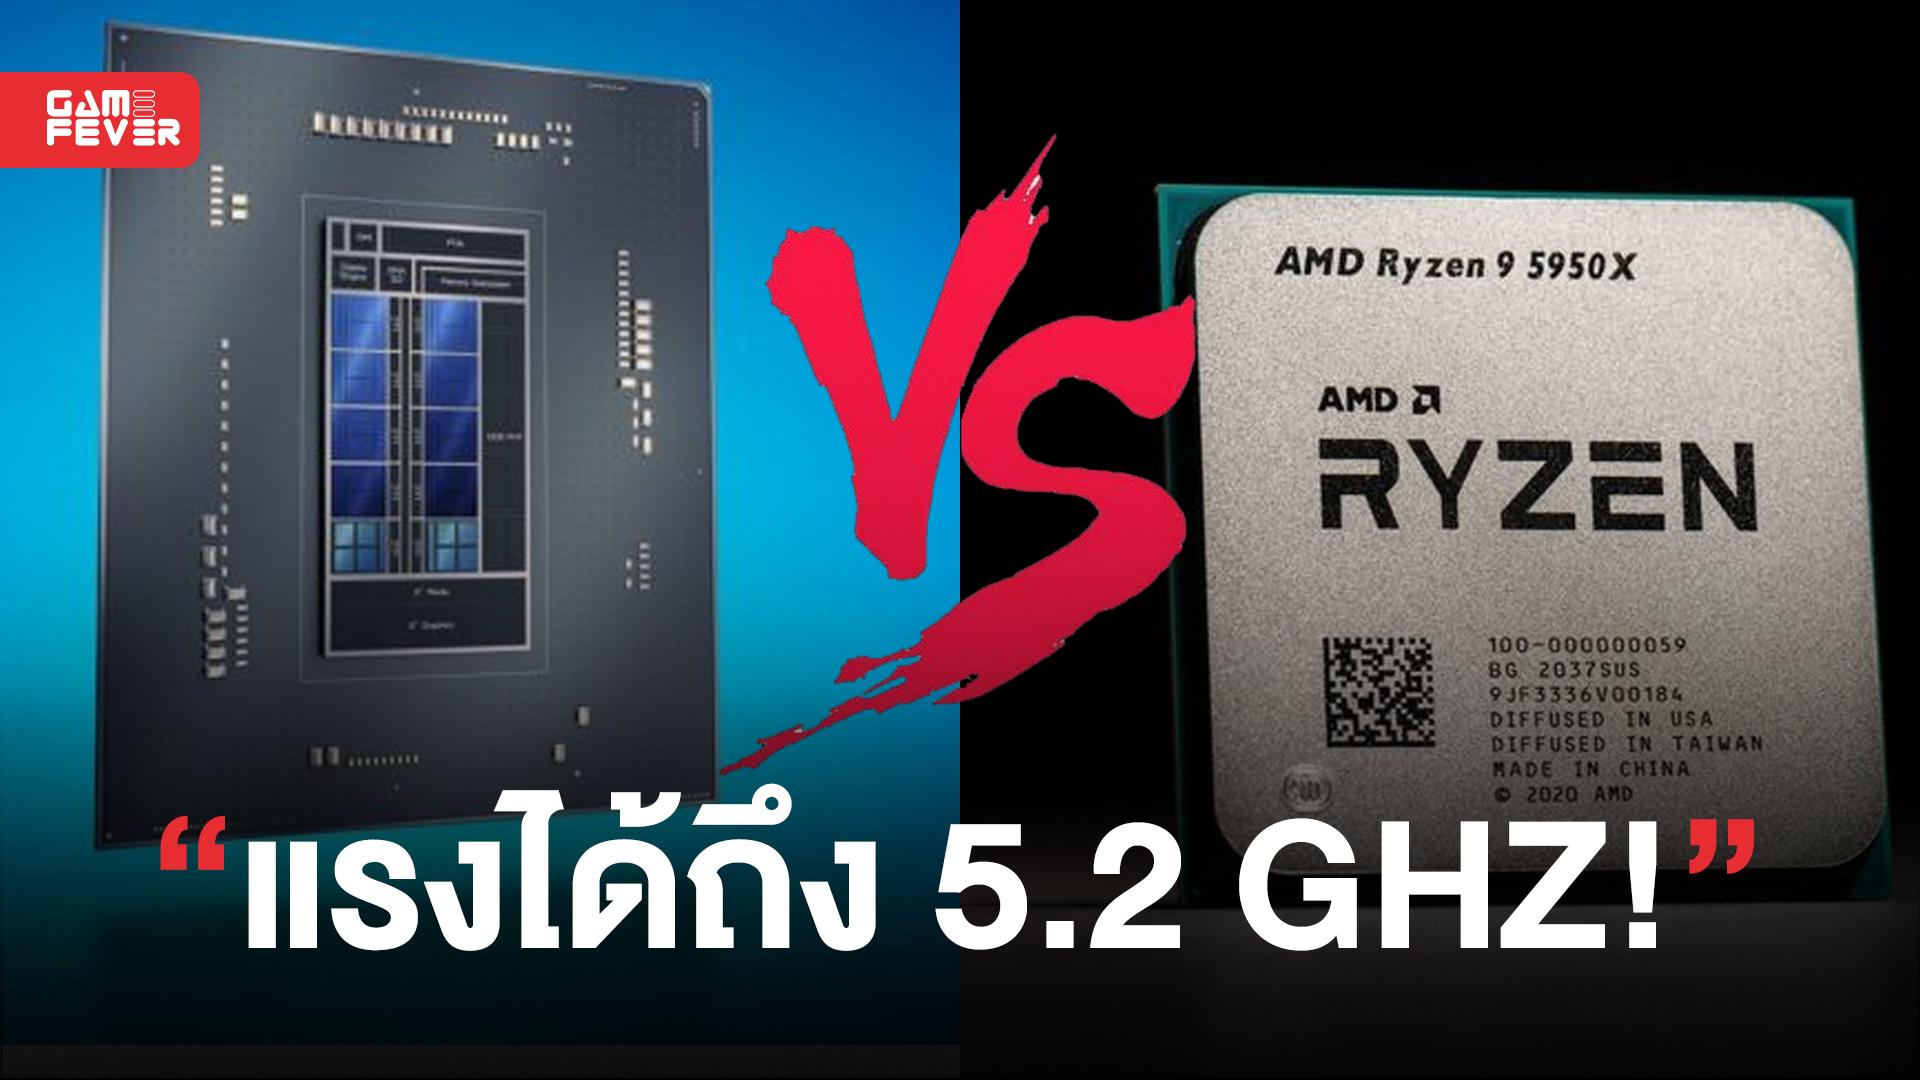 i9-12900K สามารถ Overclocked ได้ถึง 5.2 GHz ทำคะแนน Multi เท่า R9 5950X